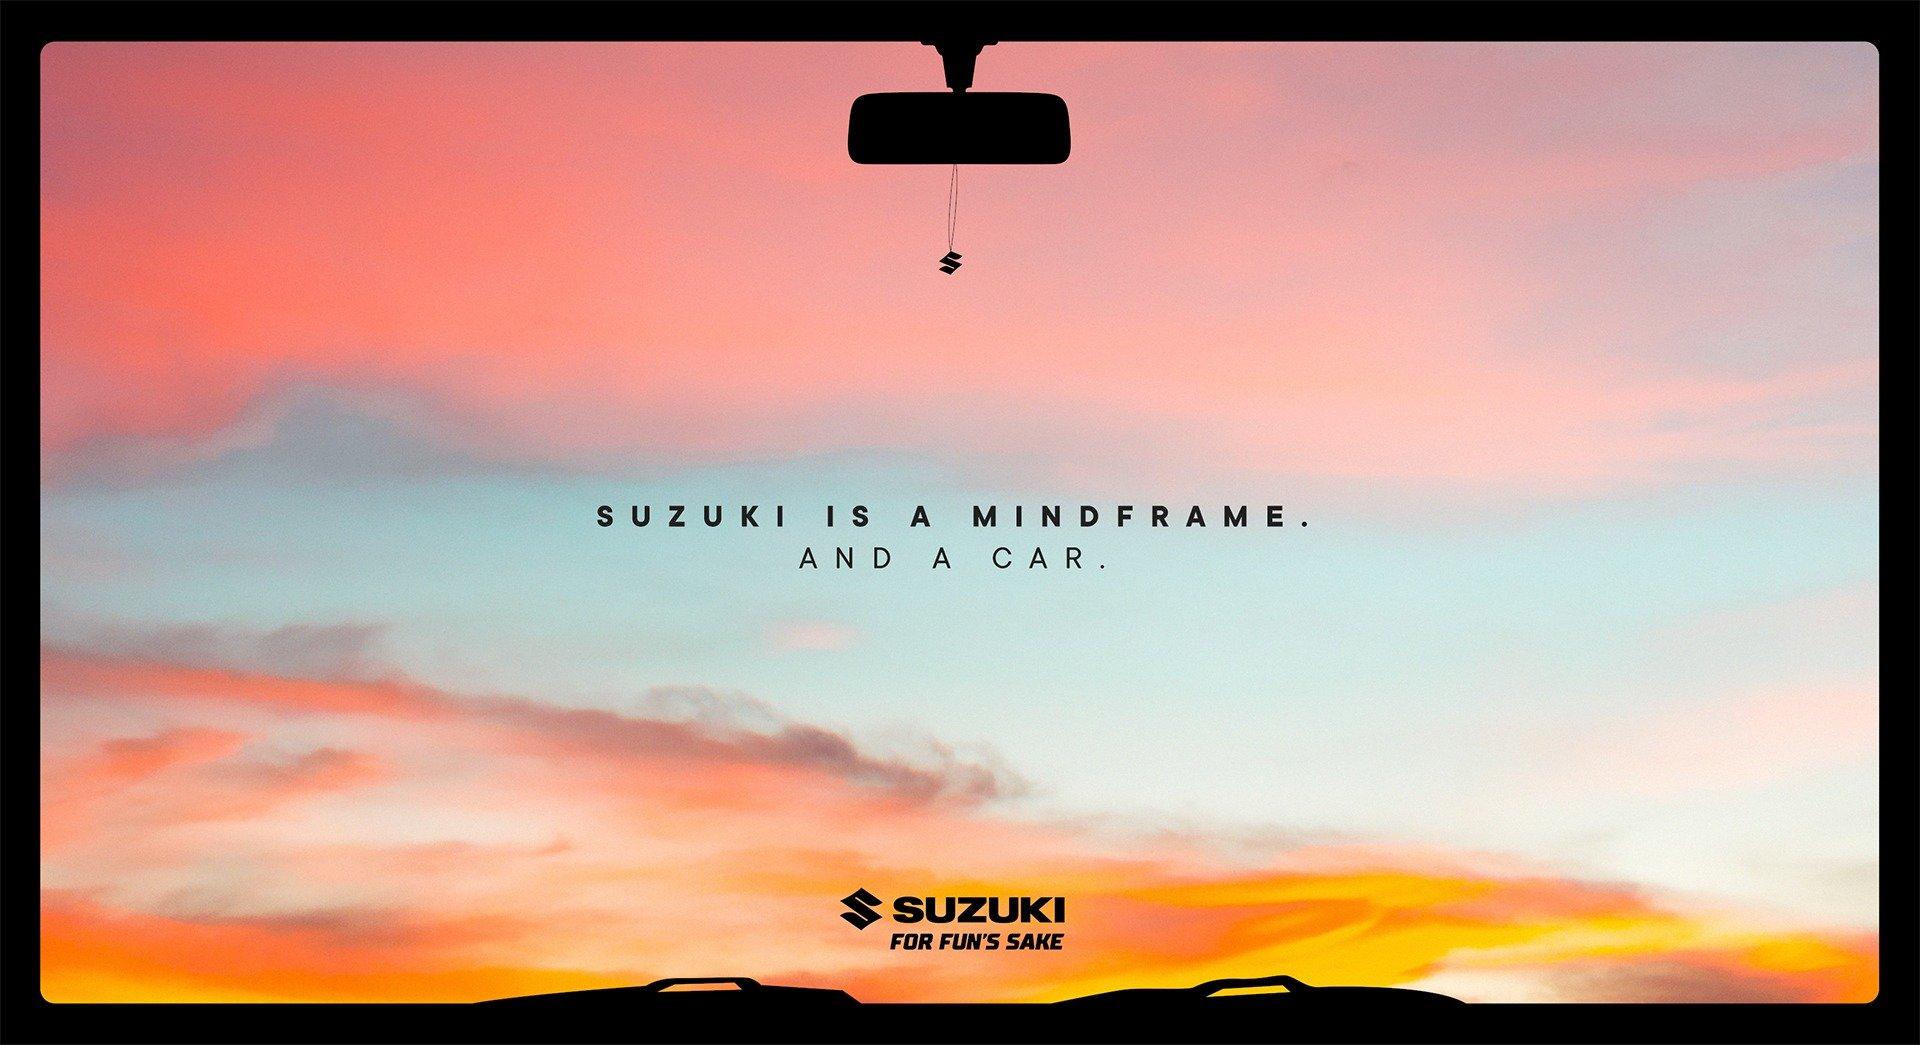 suzuki-mandurah-mindframe